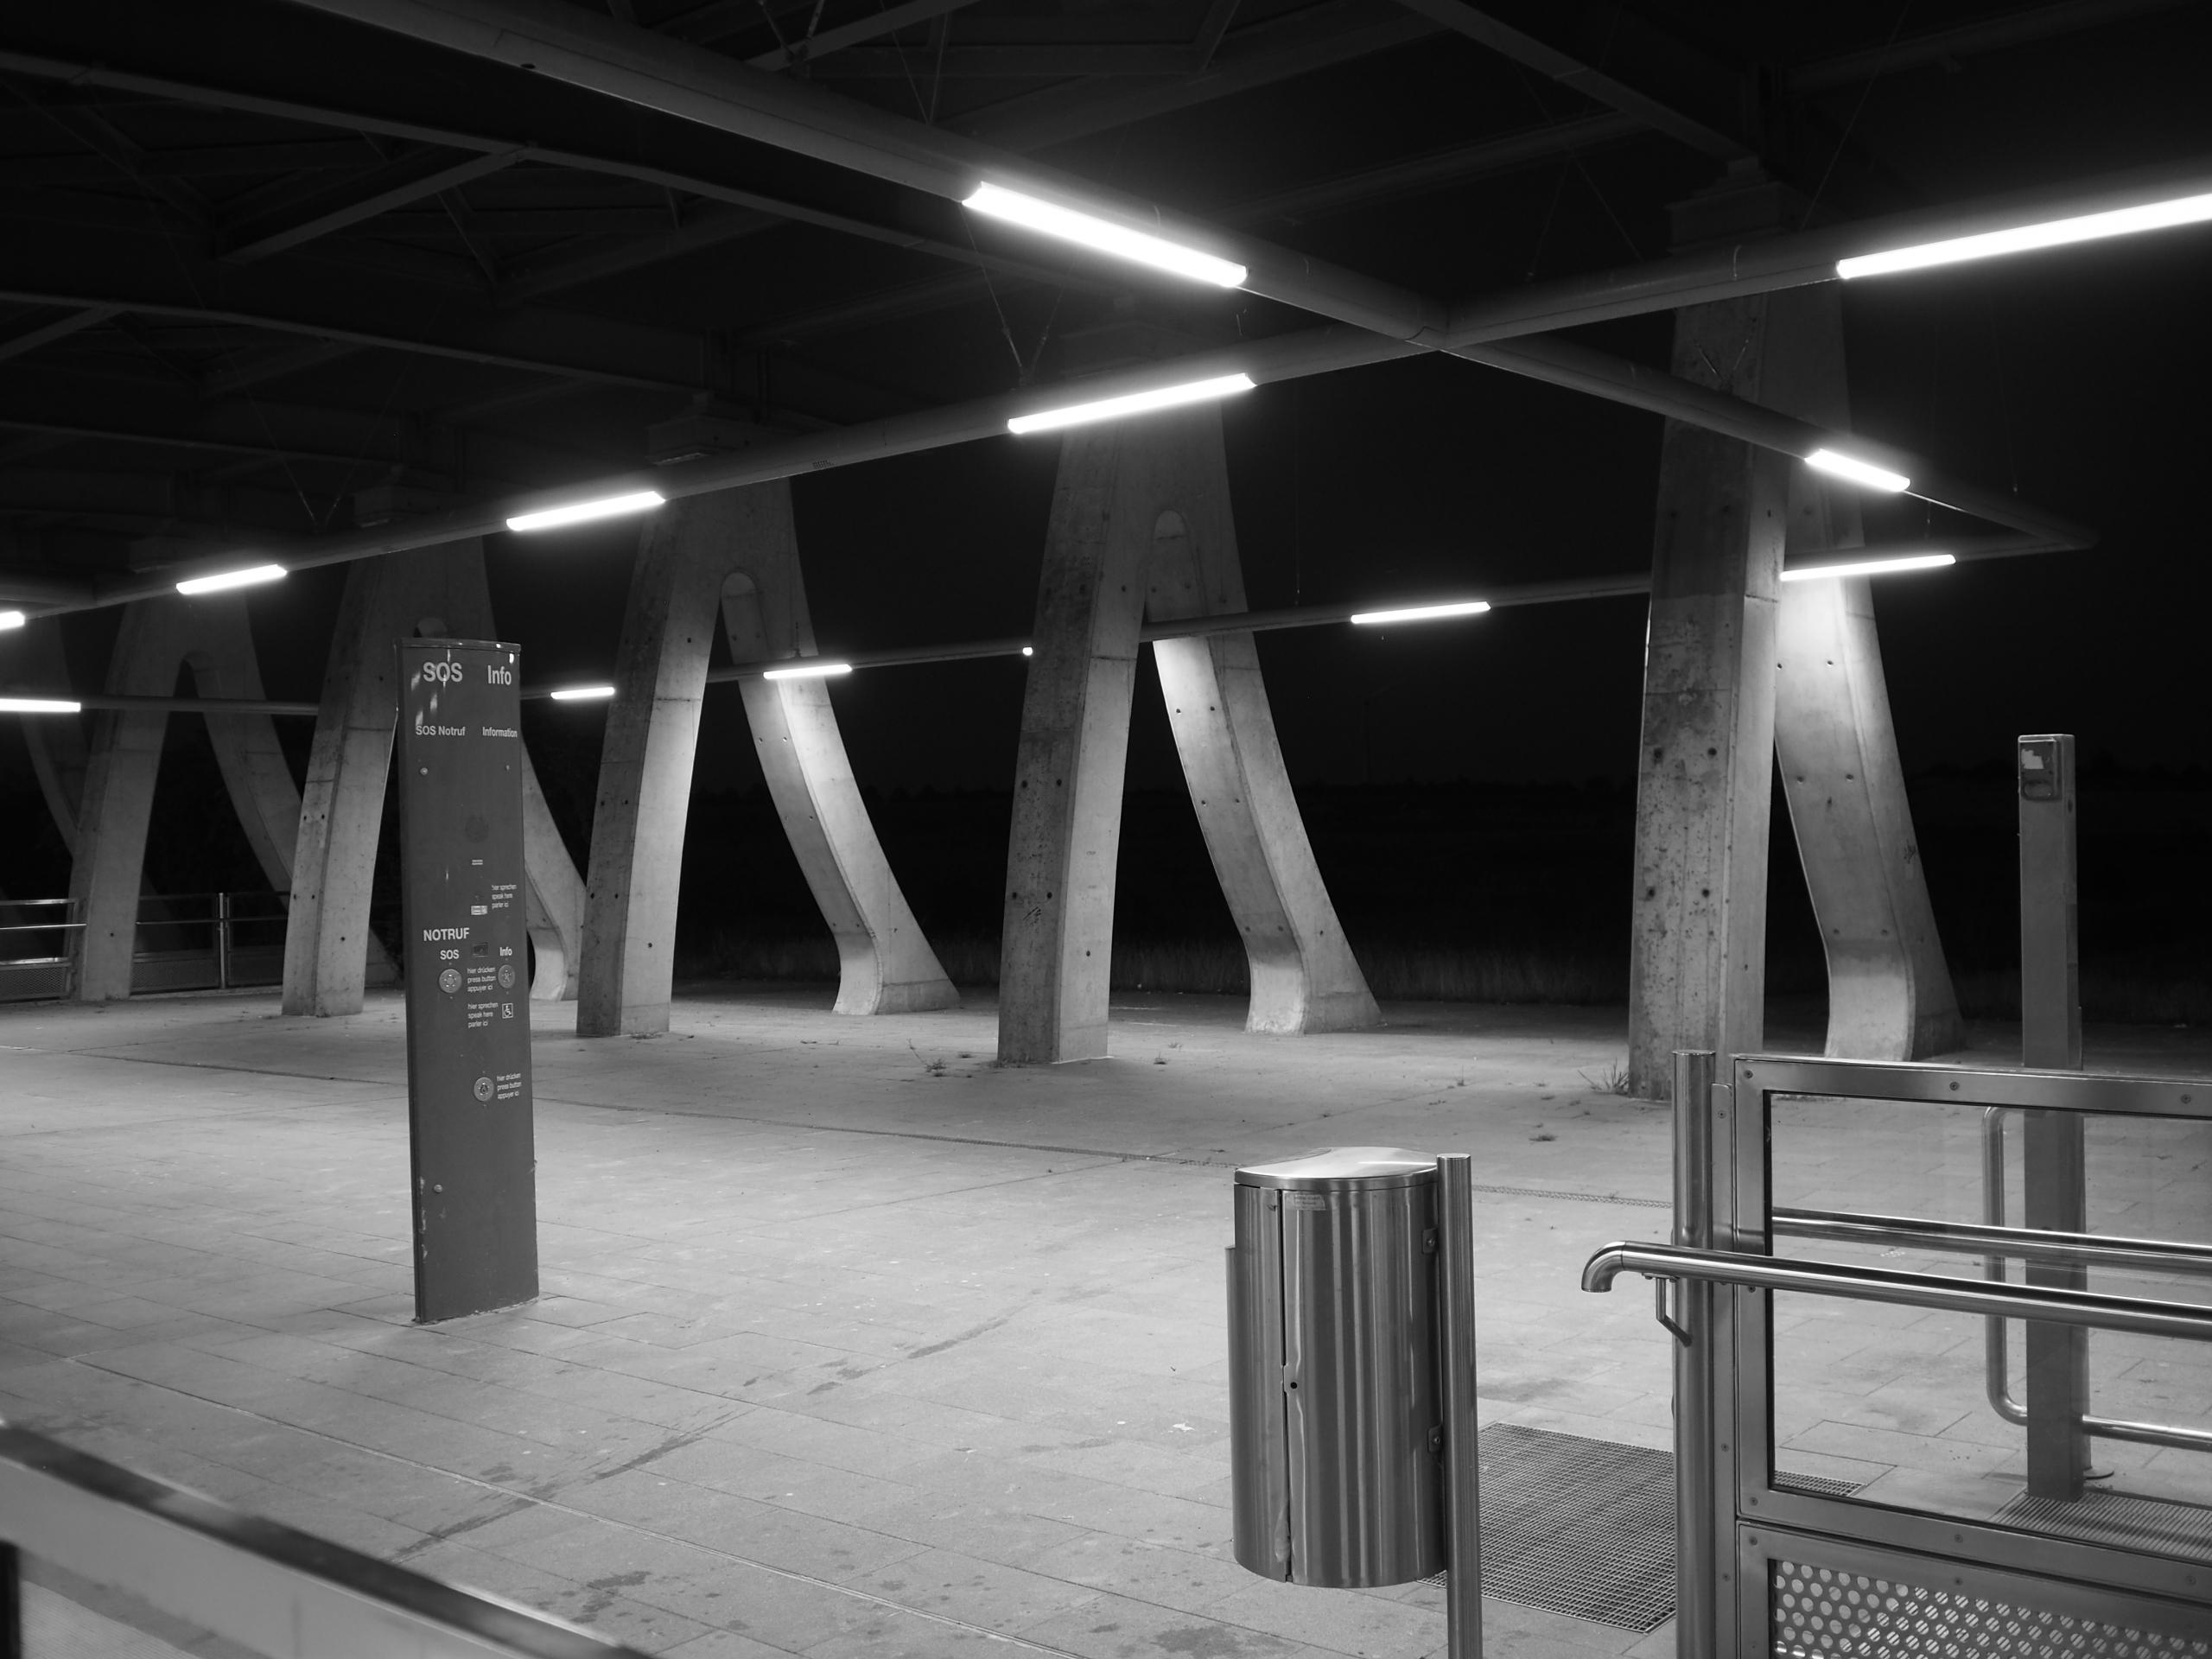 Streetfotografie Hannover Bahnhof Messe